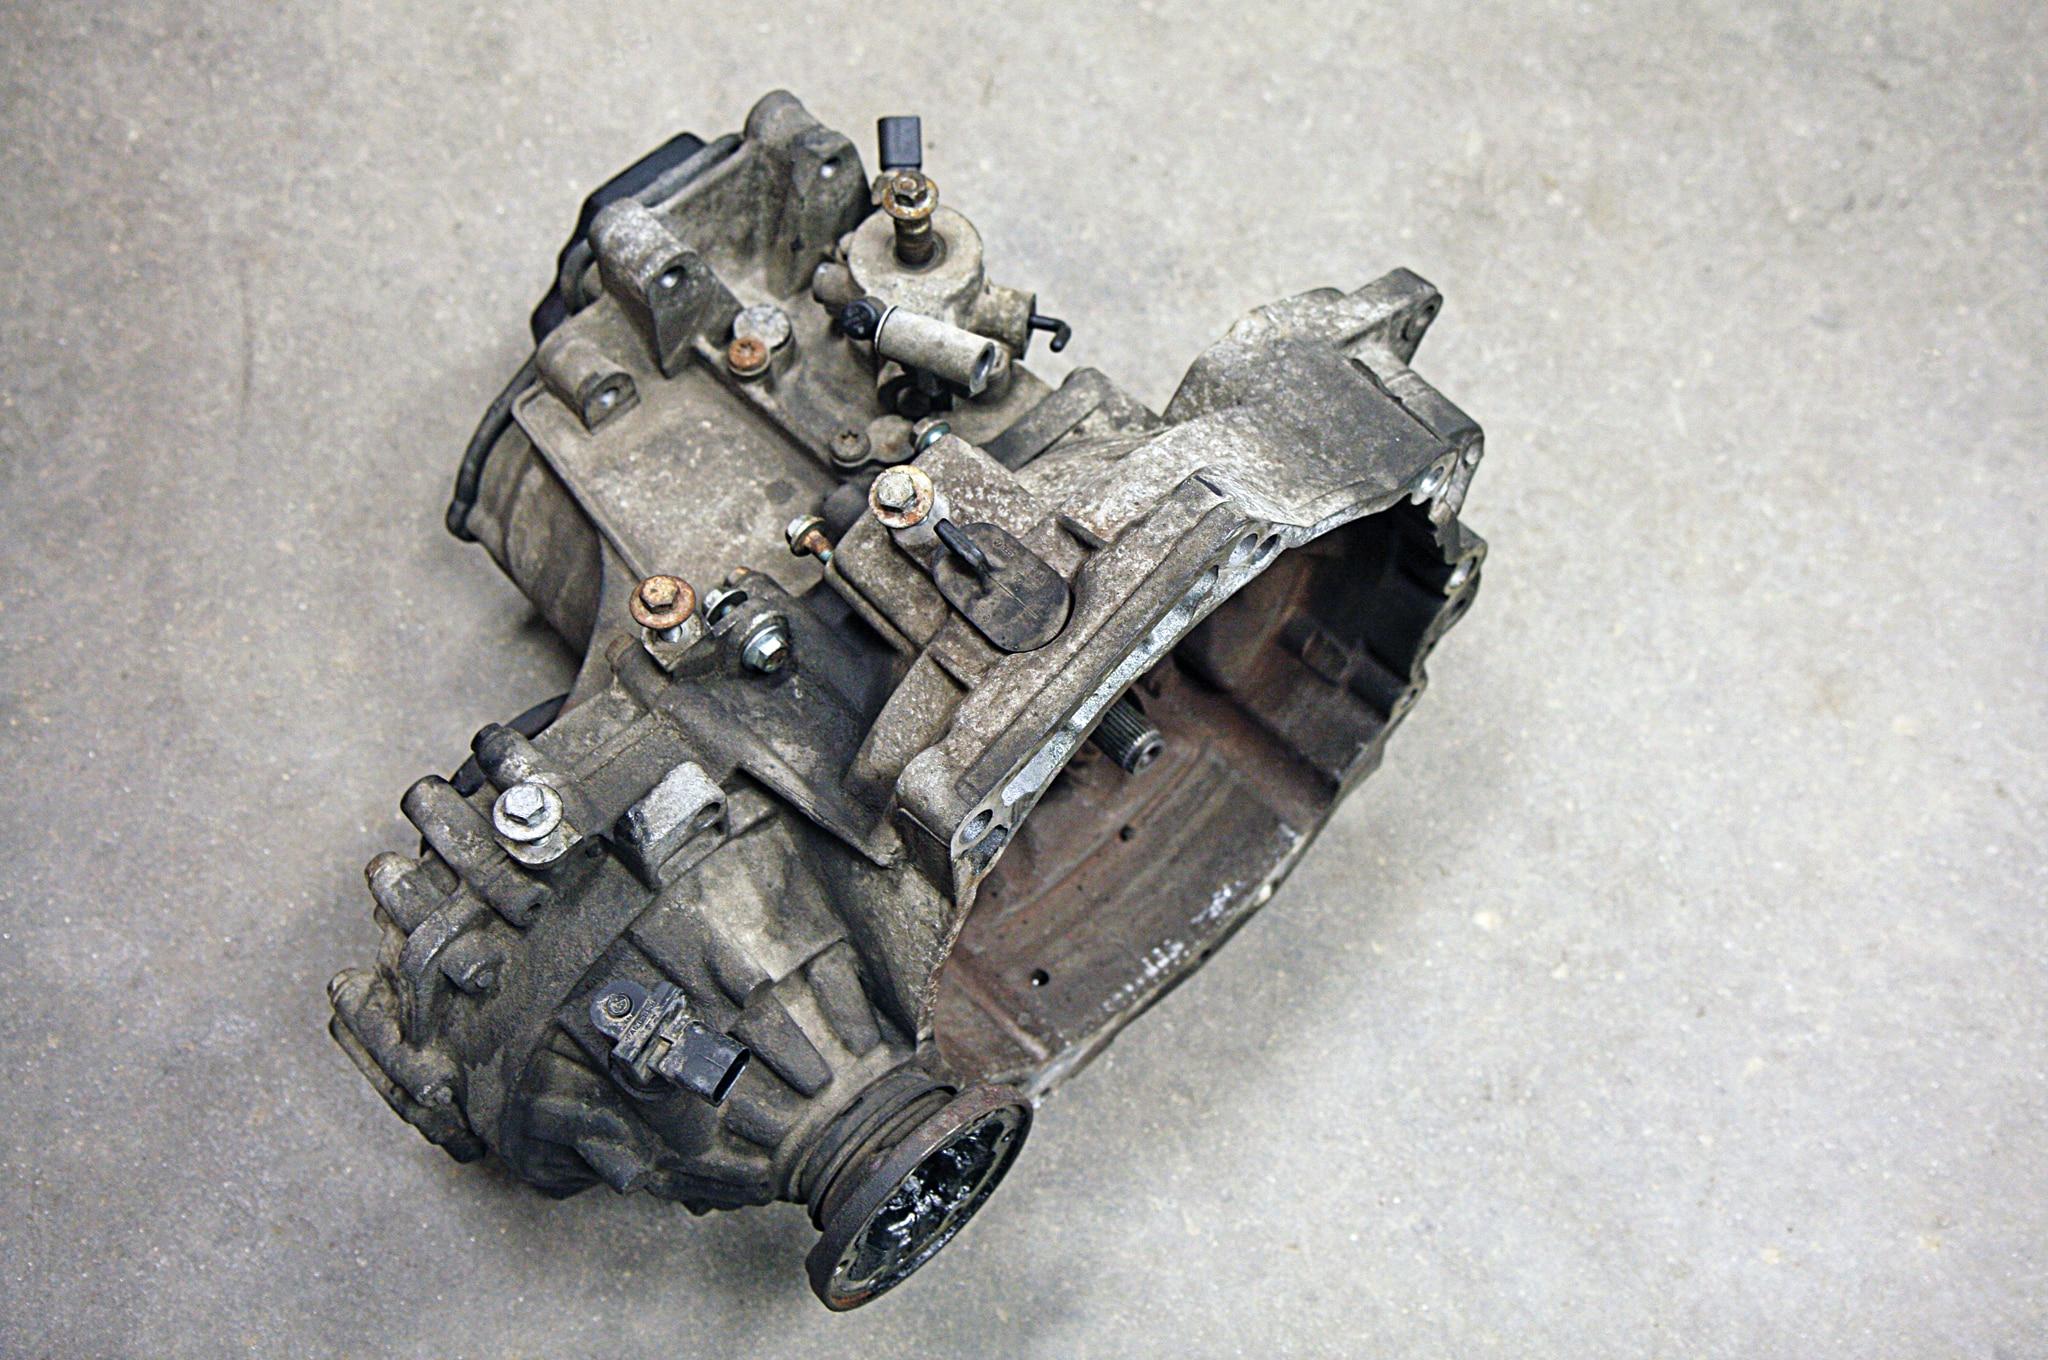 2002 volkswagen jetta tdi stock auto transmission view photo gallery 13 photos [ 2048 x 1360 Pixel ]